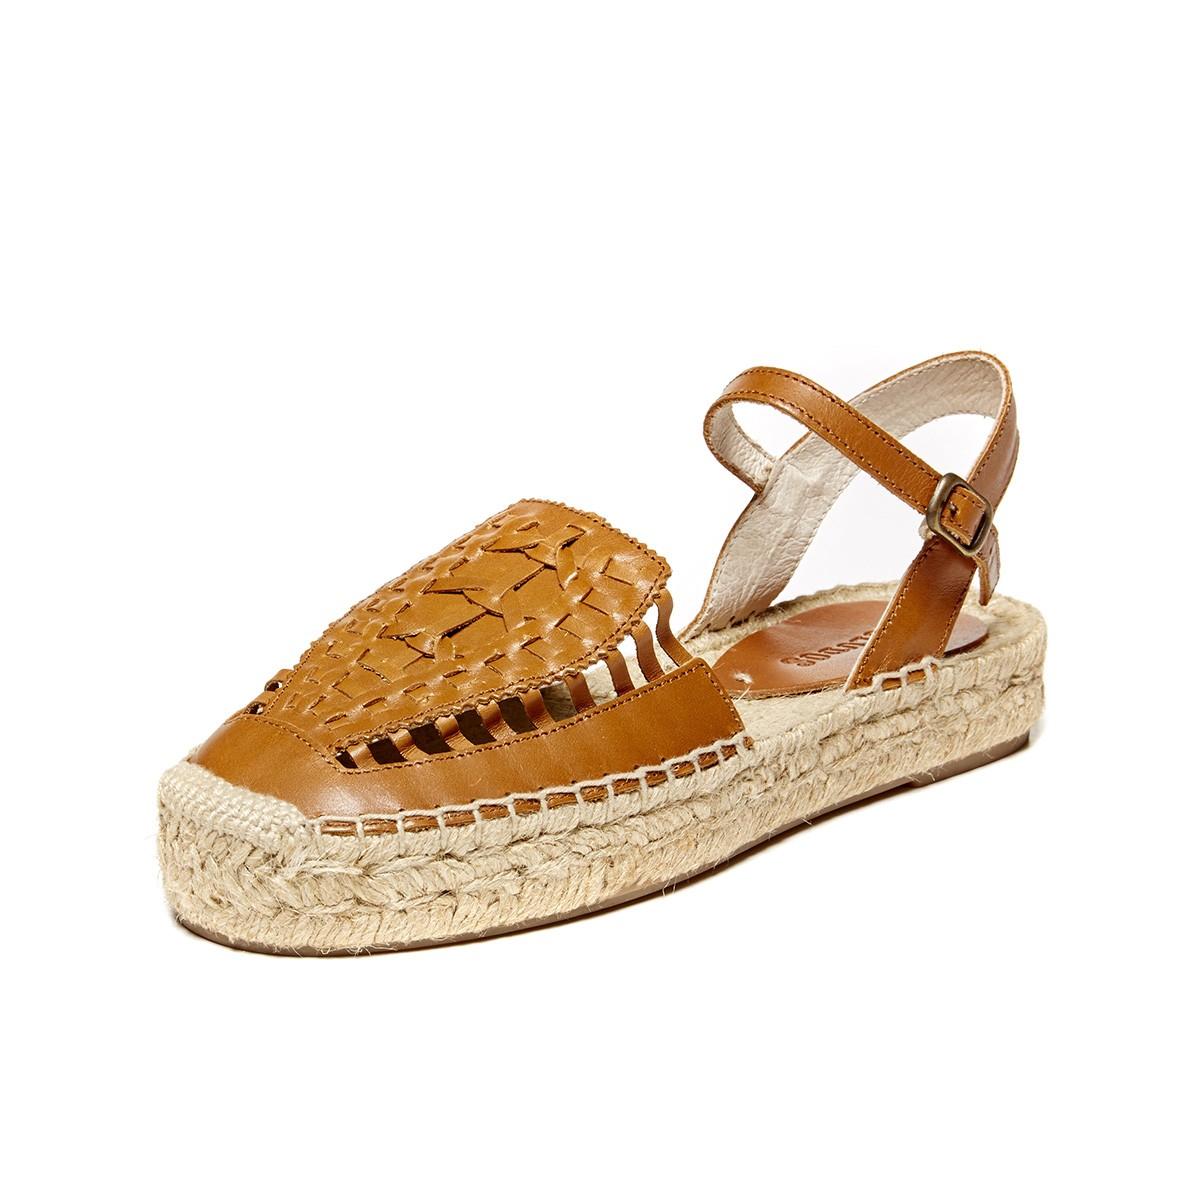 43b344f2d686 Soludos Vachetta Leather Huarache Sandal - Soludos Espadrilles